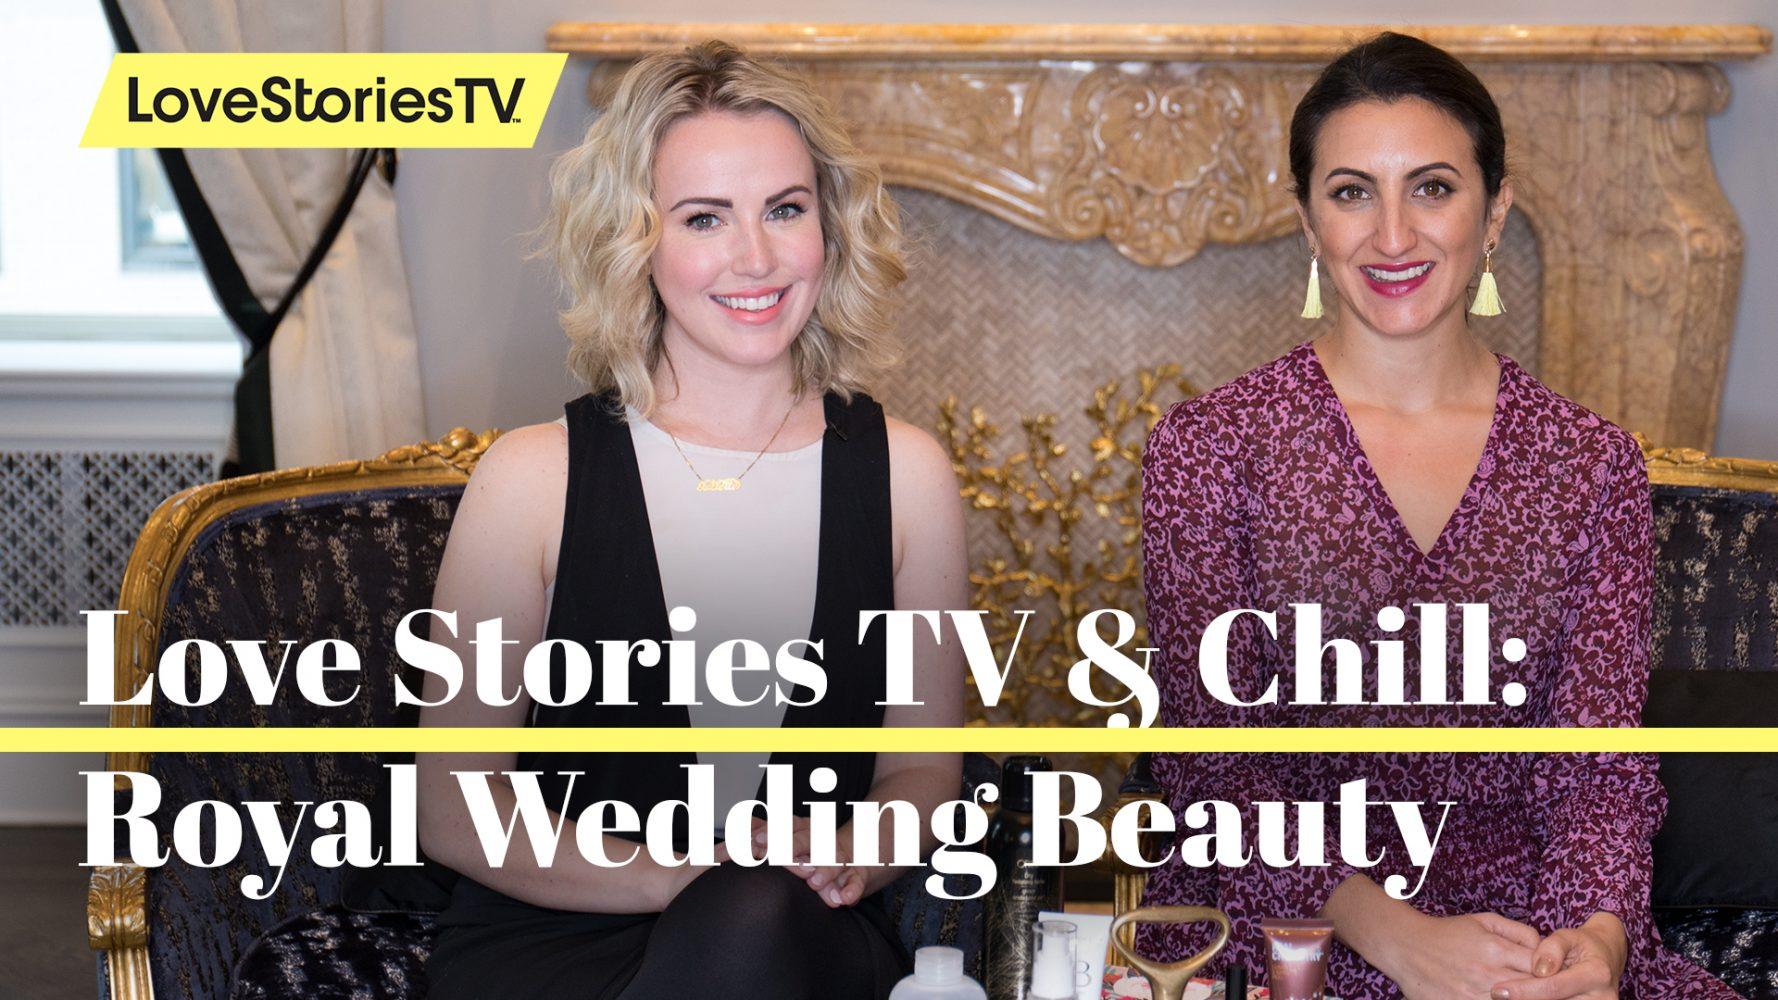 #LoveStoriesTVandChill Episode 18: Royal Wedding Beauty With Birchbox